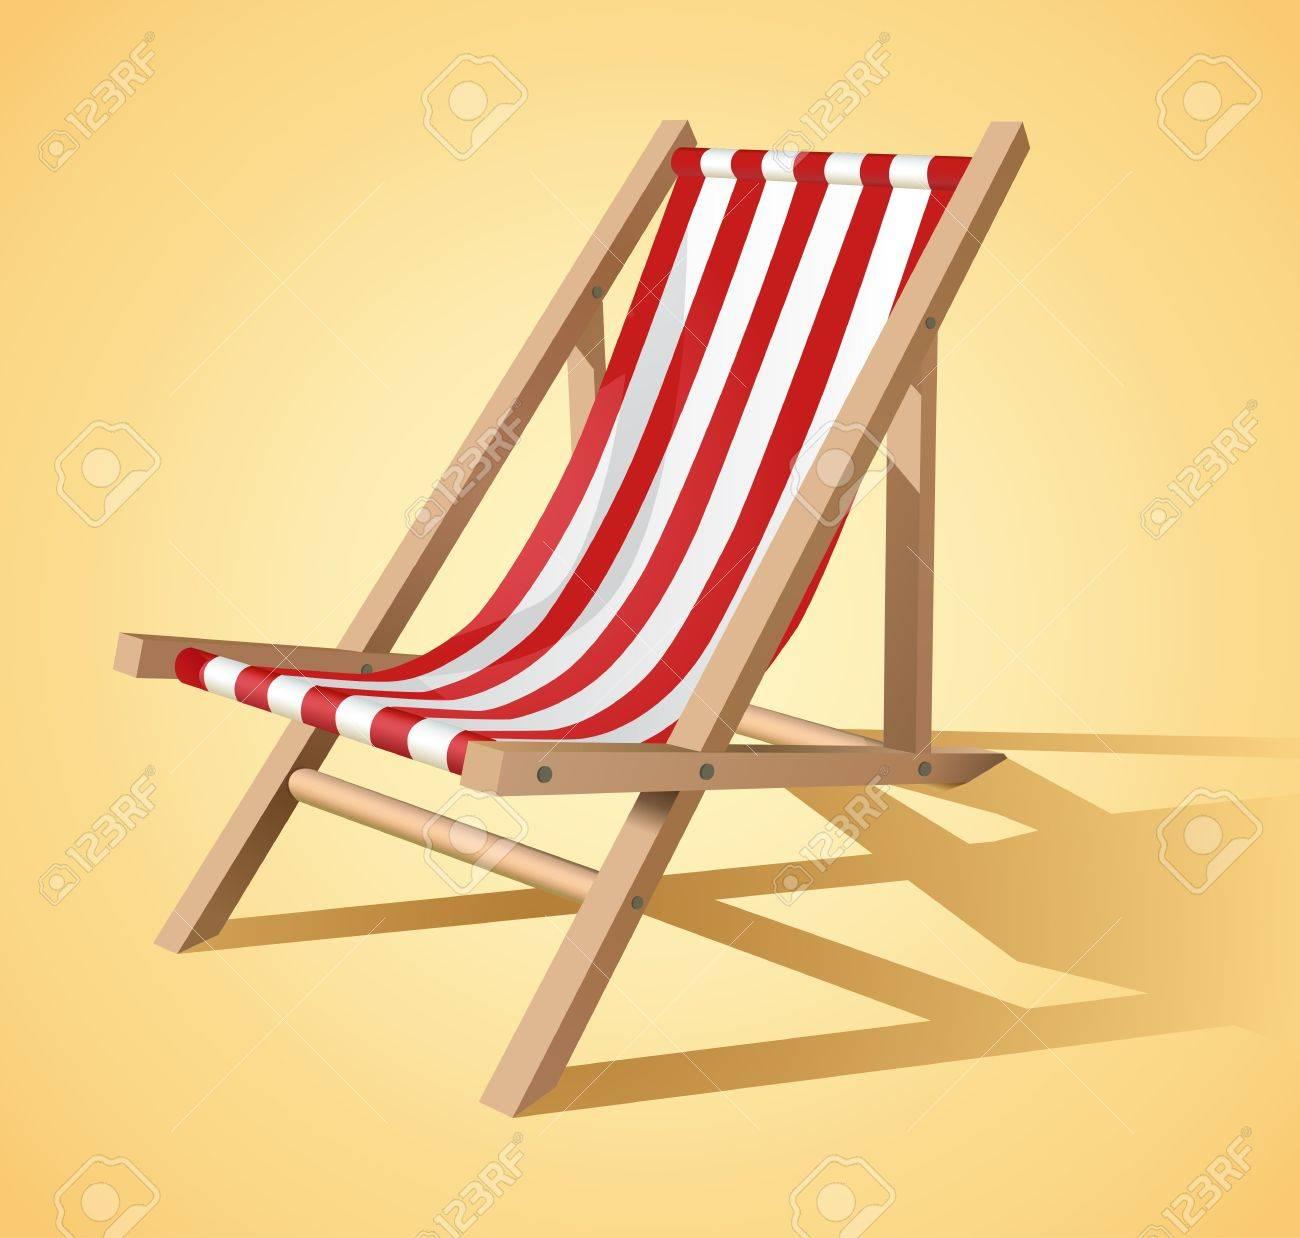 Beach chair vector - 9264266